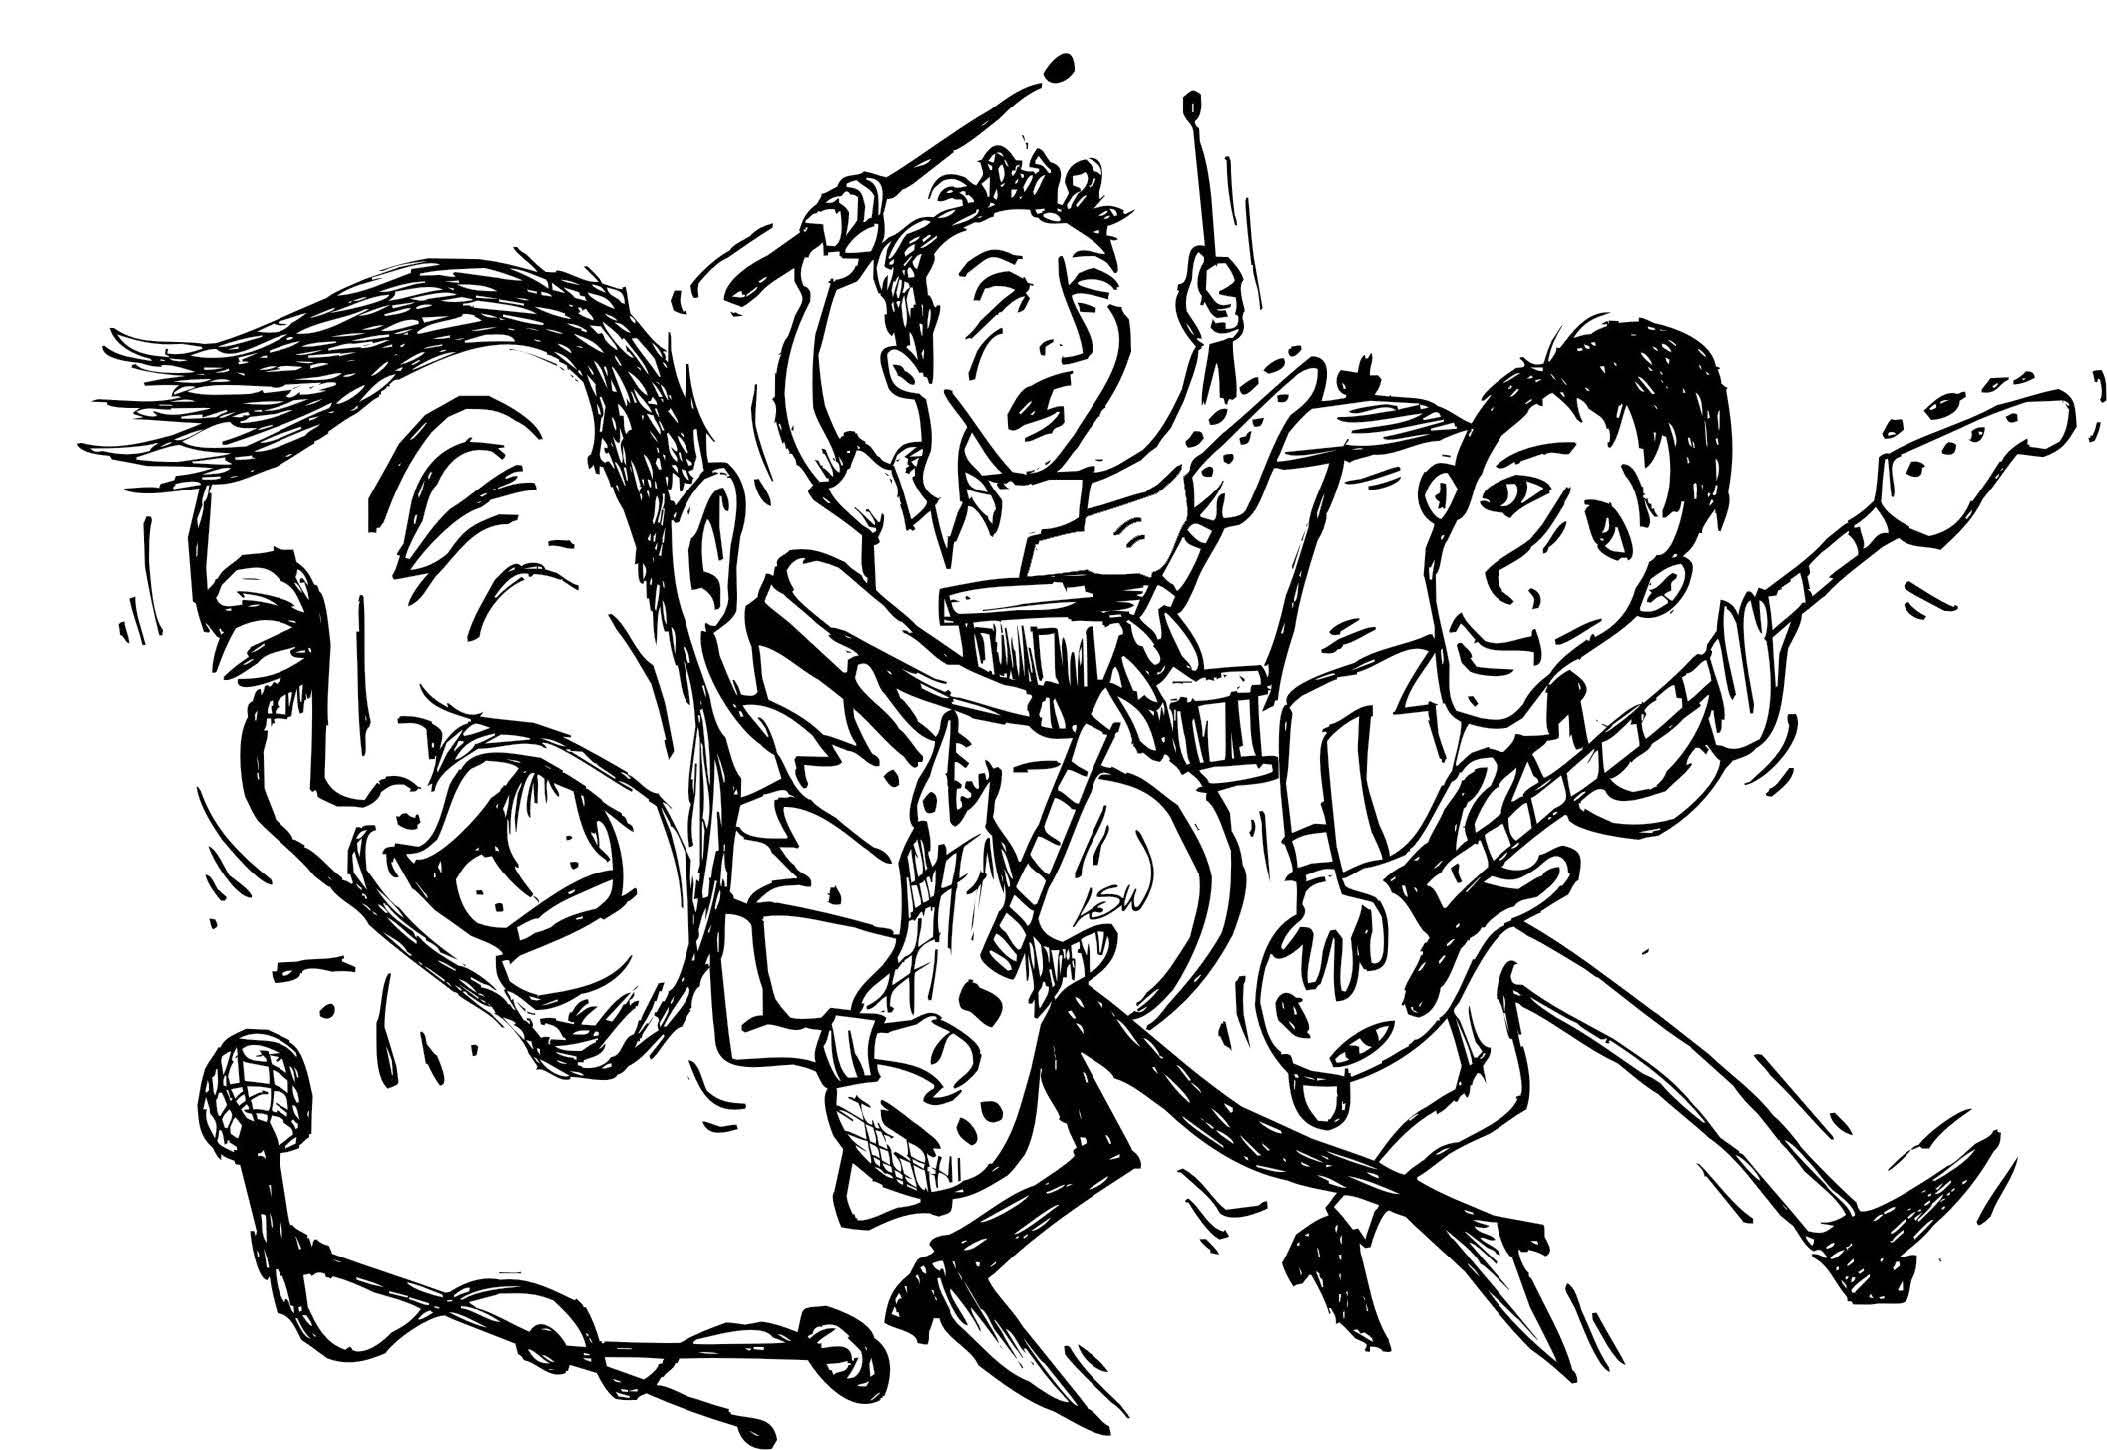 Dash Rip Rock -- Illustratoin by L. Steve Williams